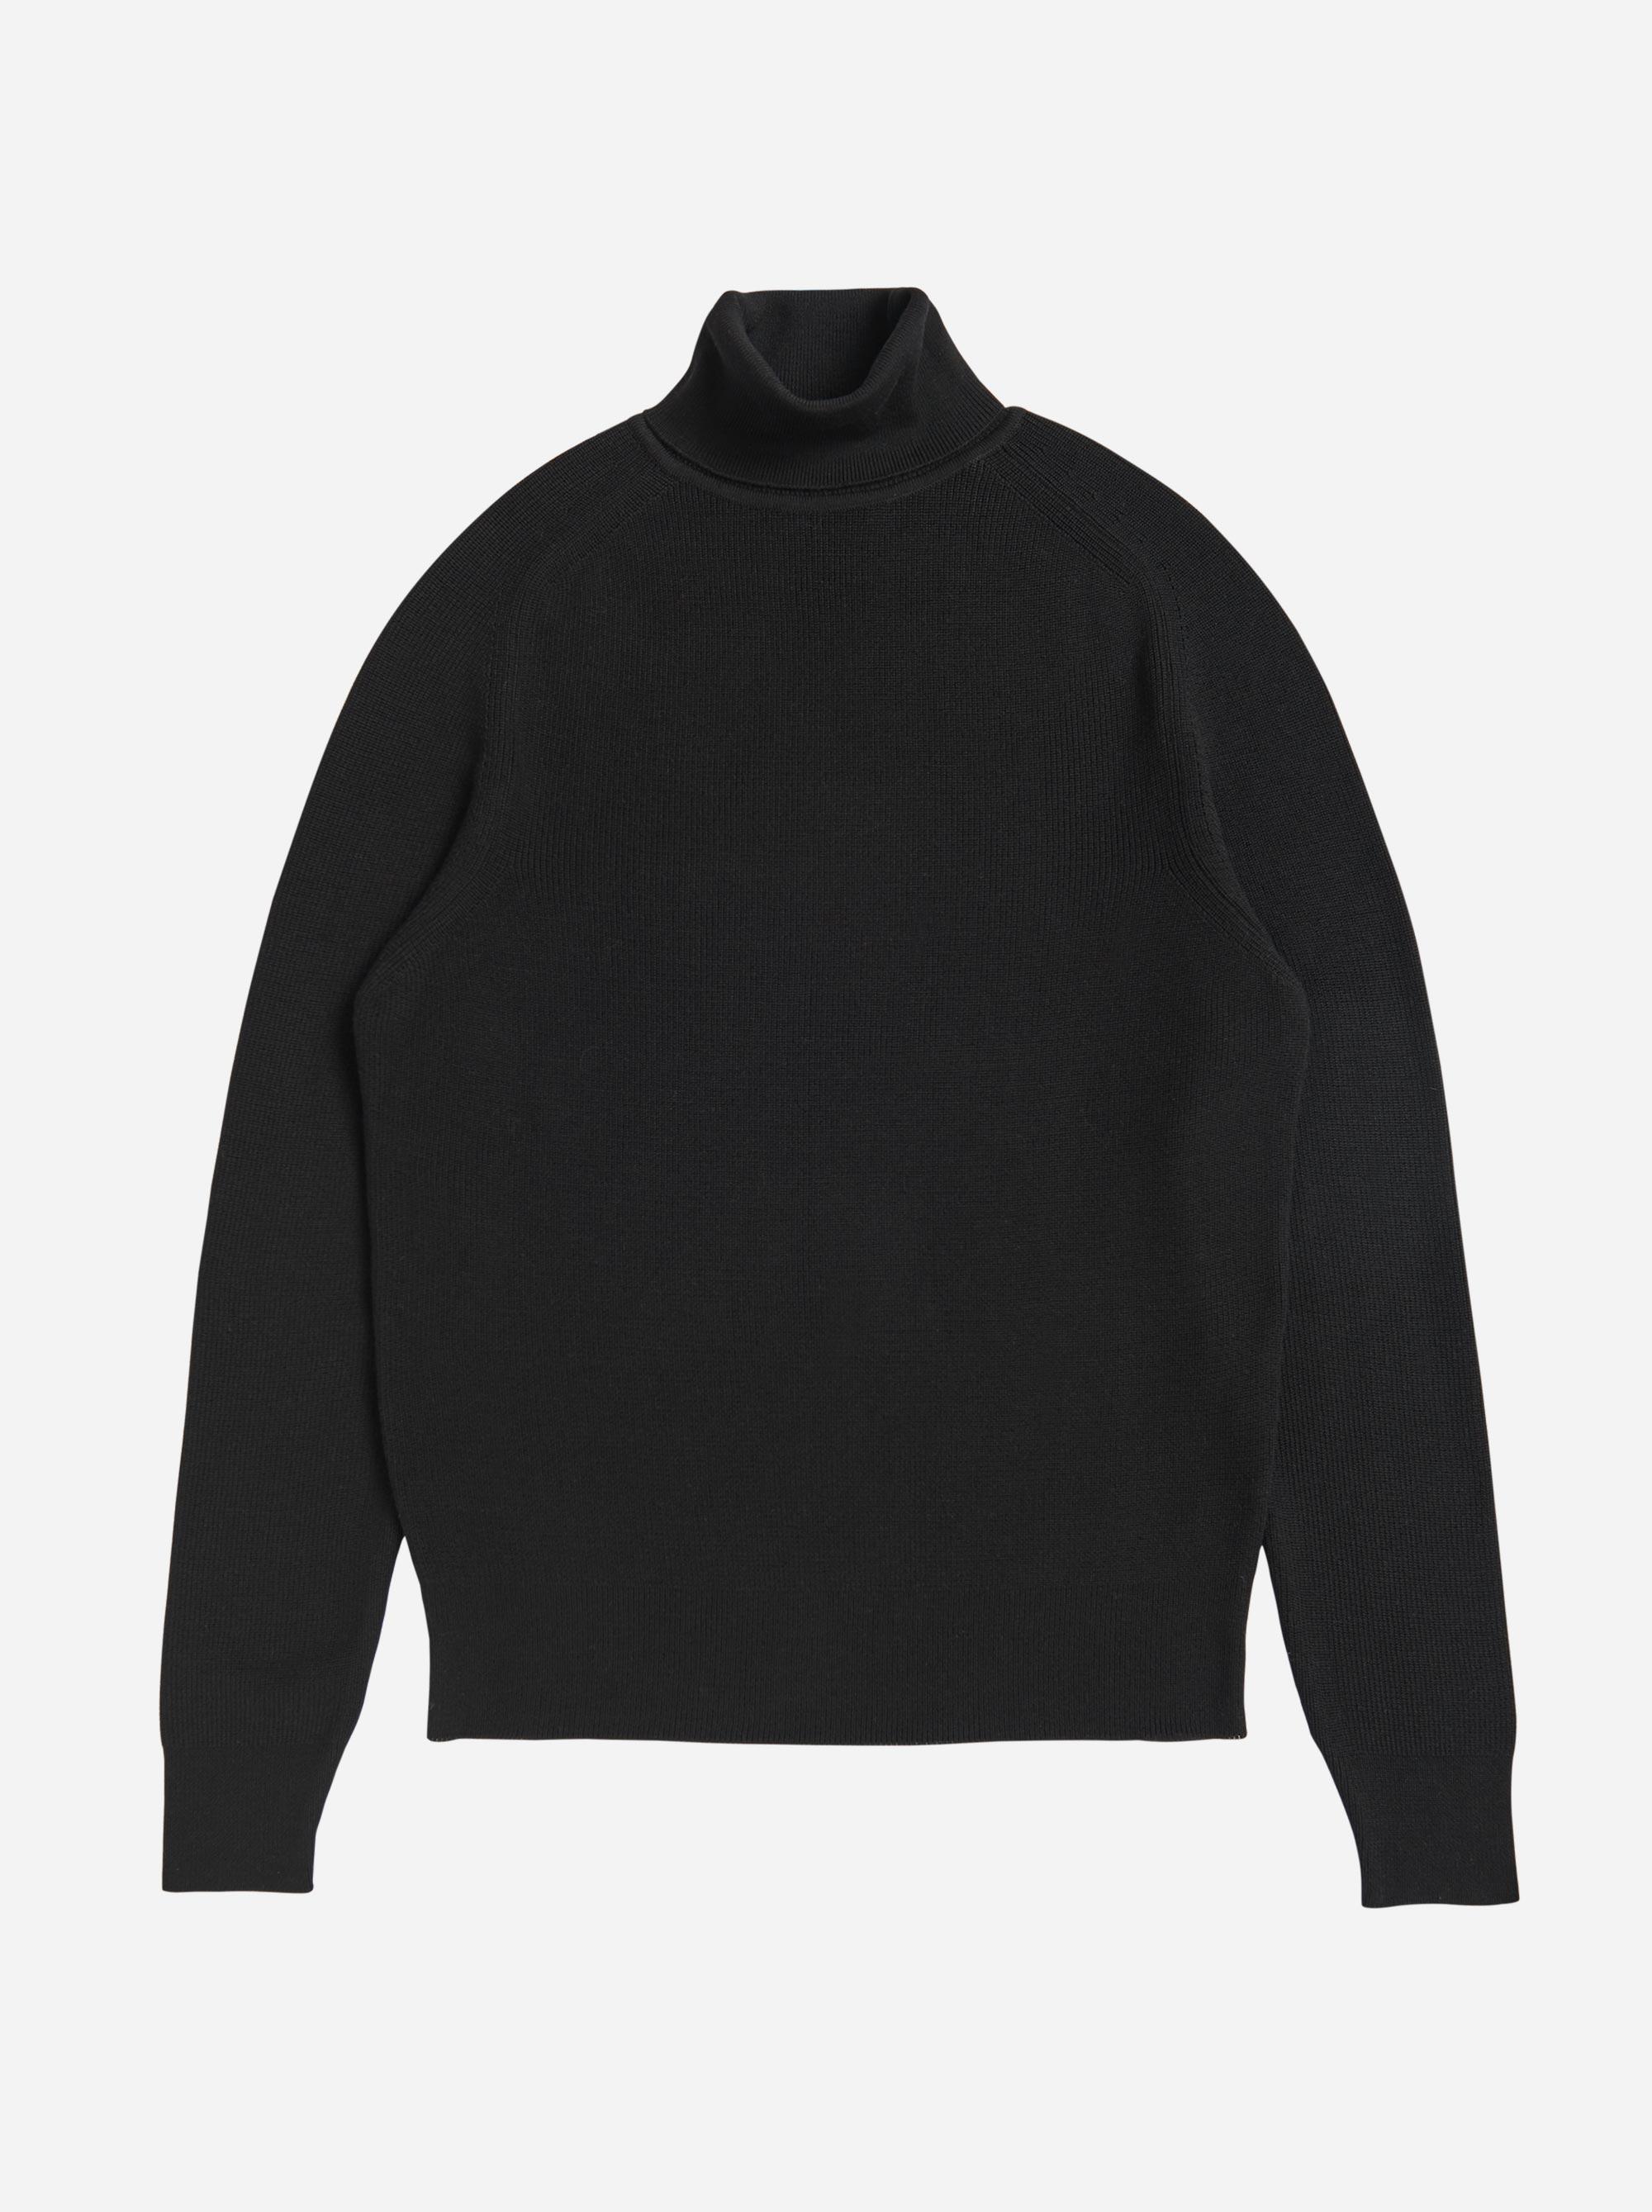 Teym - Turtleneck - The Merino Sweater - Men - Black - 4